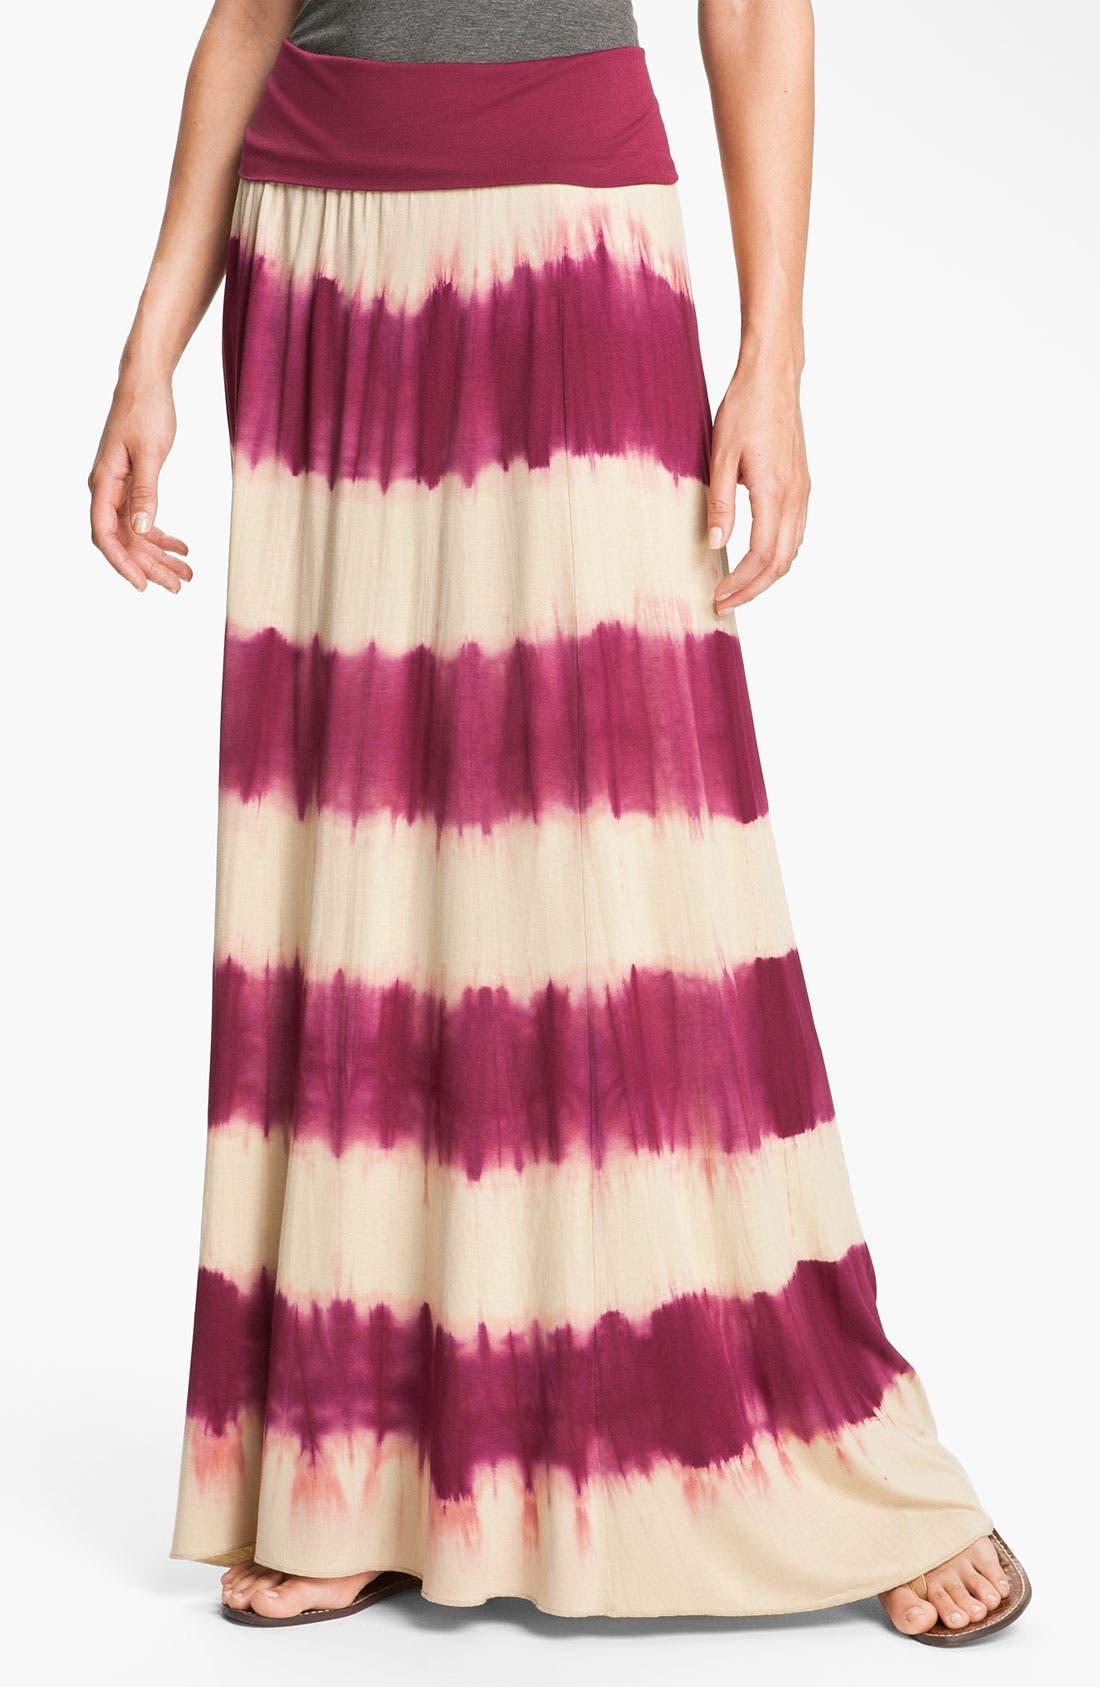 Main Image - Max & Mia Tie Dye Maxi Skirt